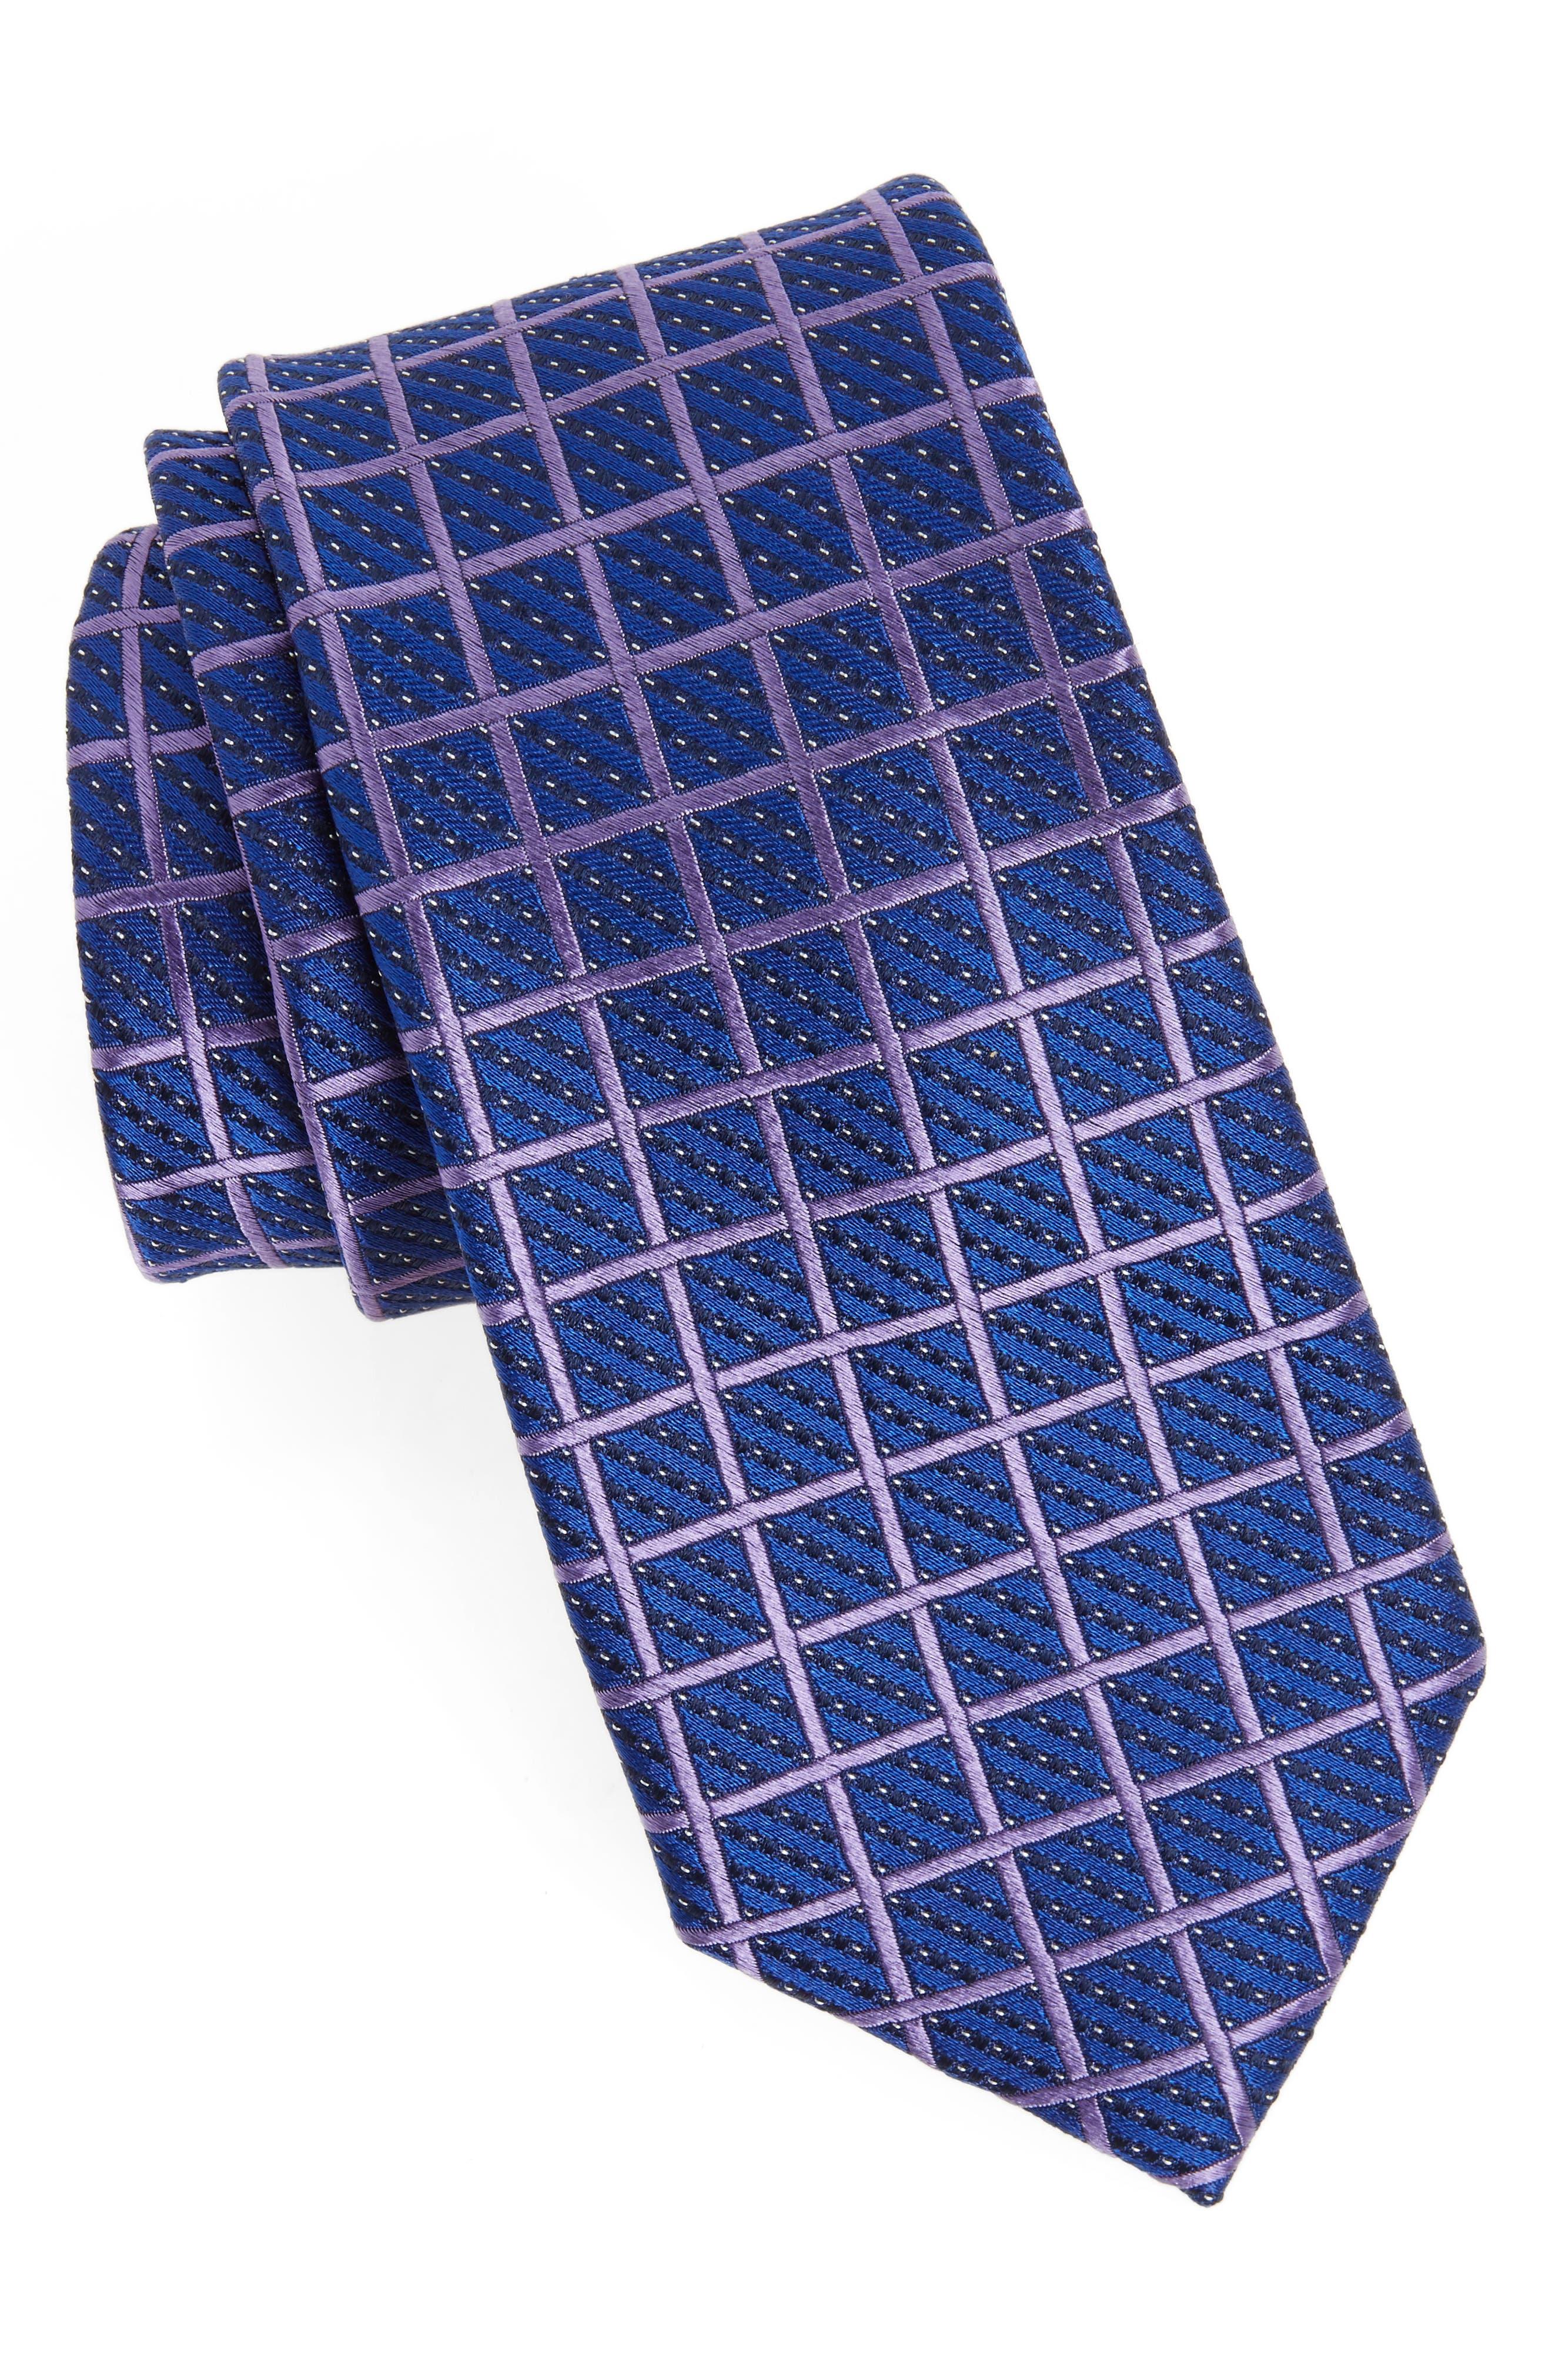 Main Image - Nordstrom Men's Shop Tattersall Silk Tie